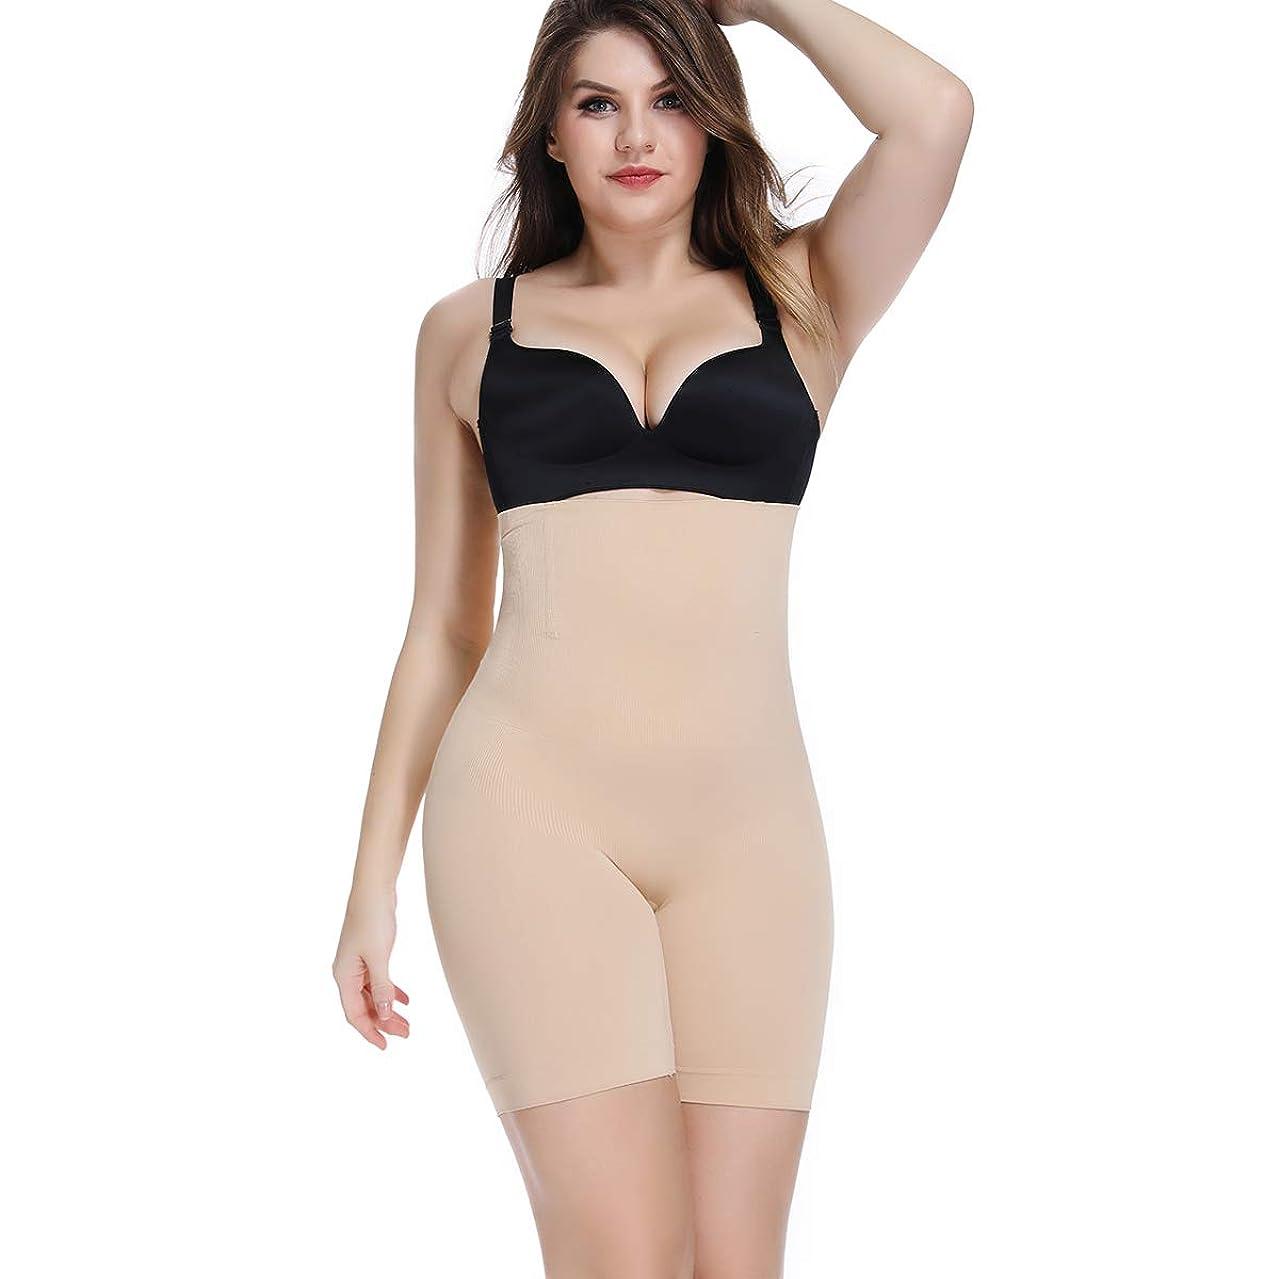 Shapewear Shorts for Women Tummy Control High Waist Body Shaper Seamless Butt Lifter Mid-Thigh Slimmer Panty